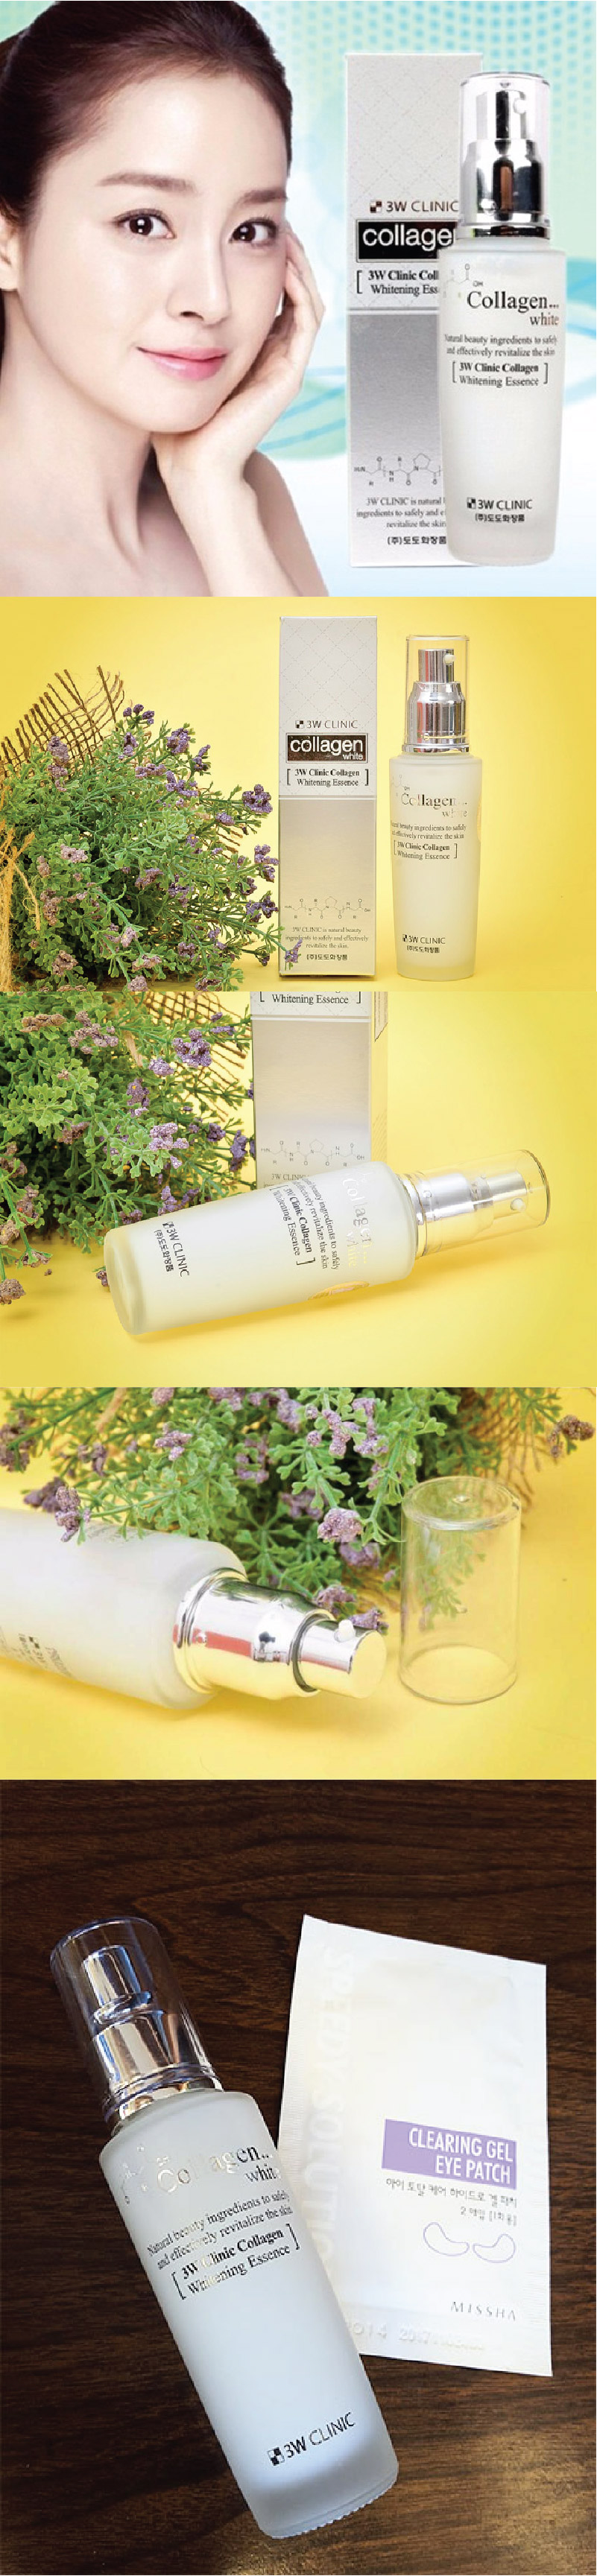 Tinh Chất Dưỡng Trắng Da 3W Clinic Collagen Whitening Essence